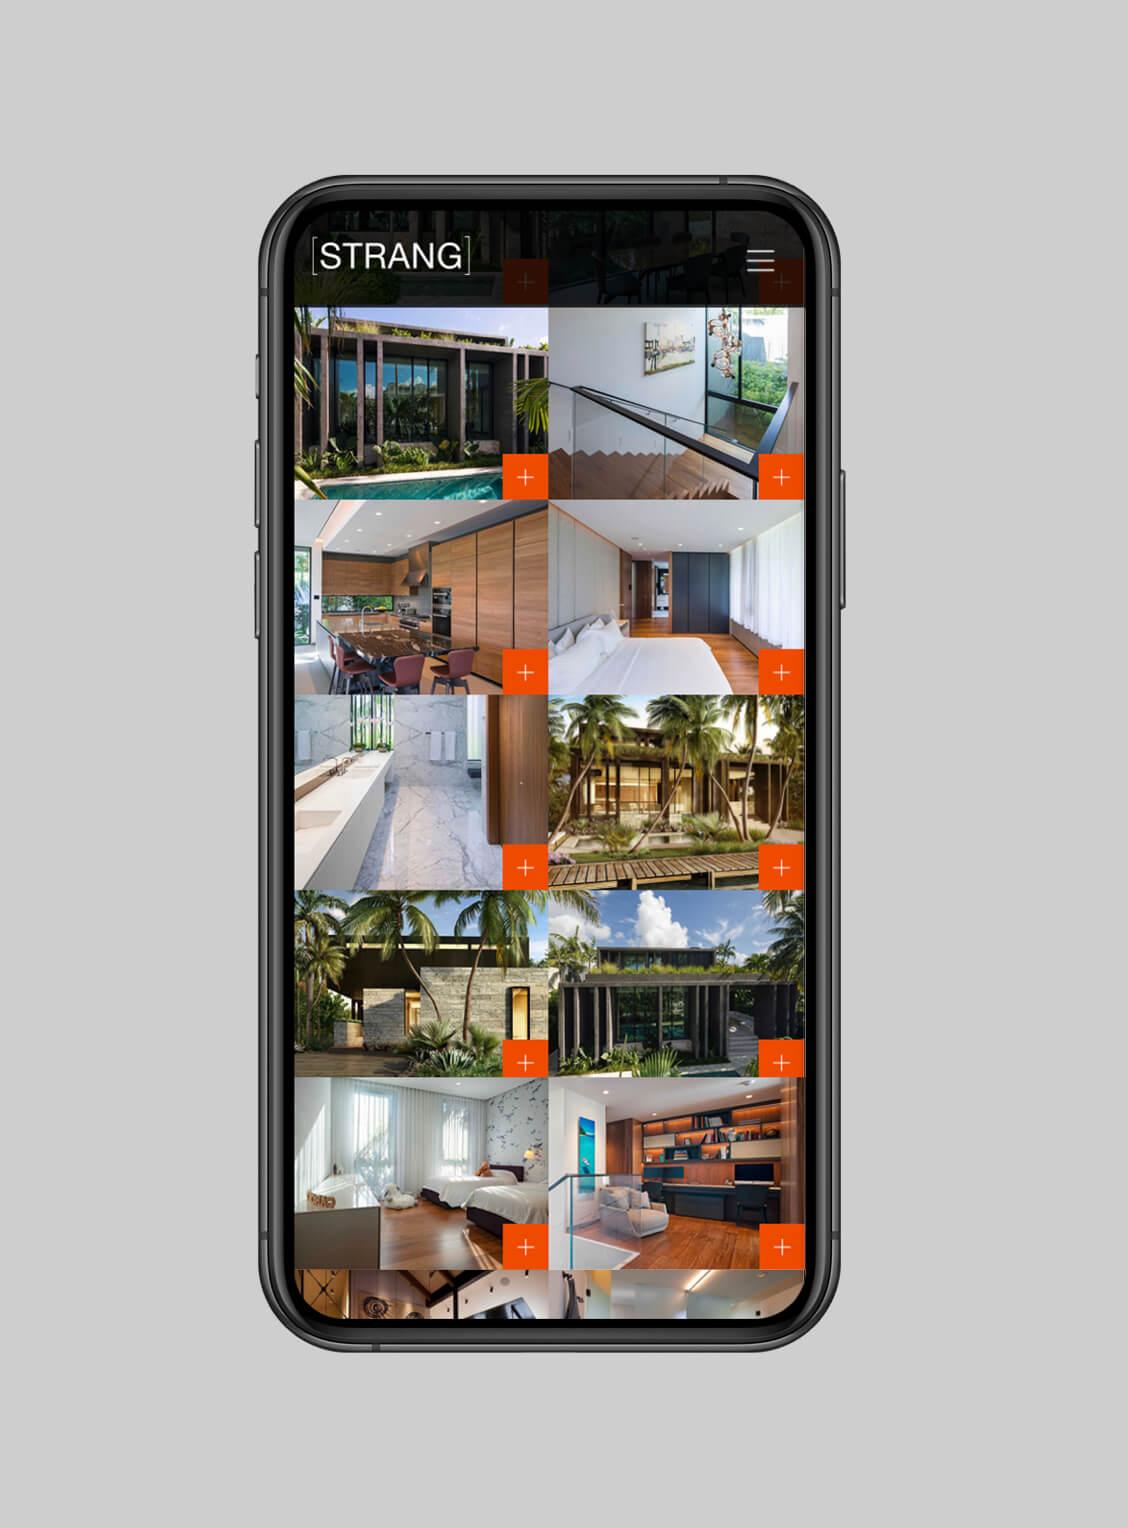 Strang Mobile Web Page 2